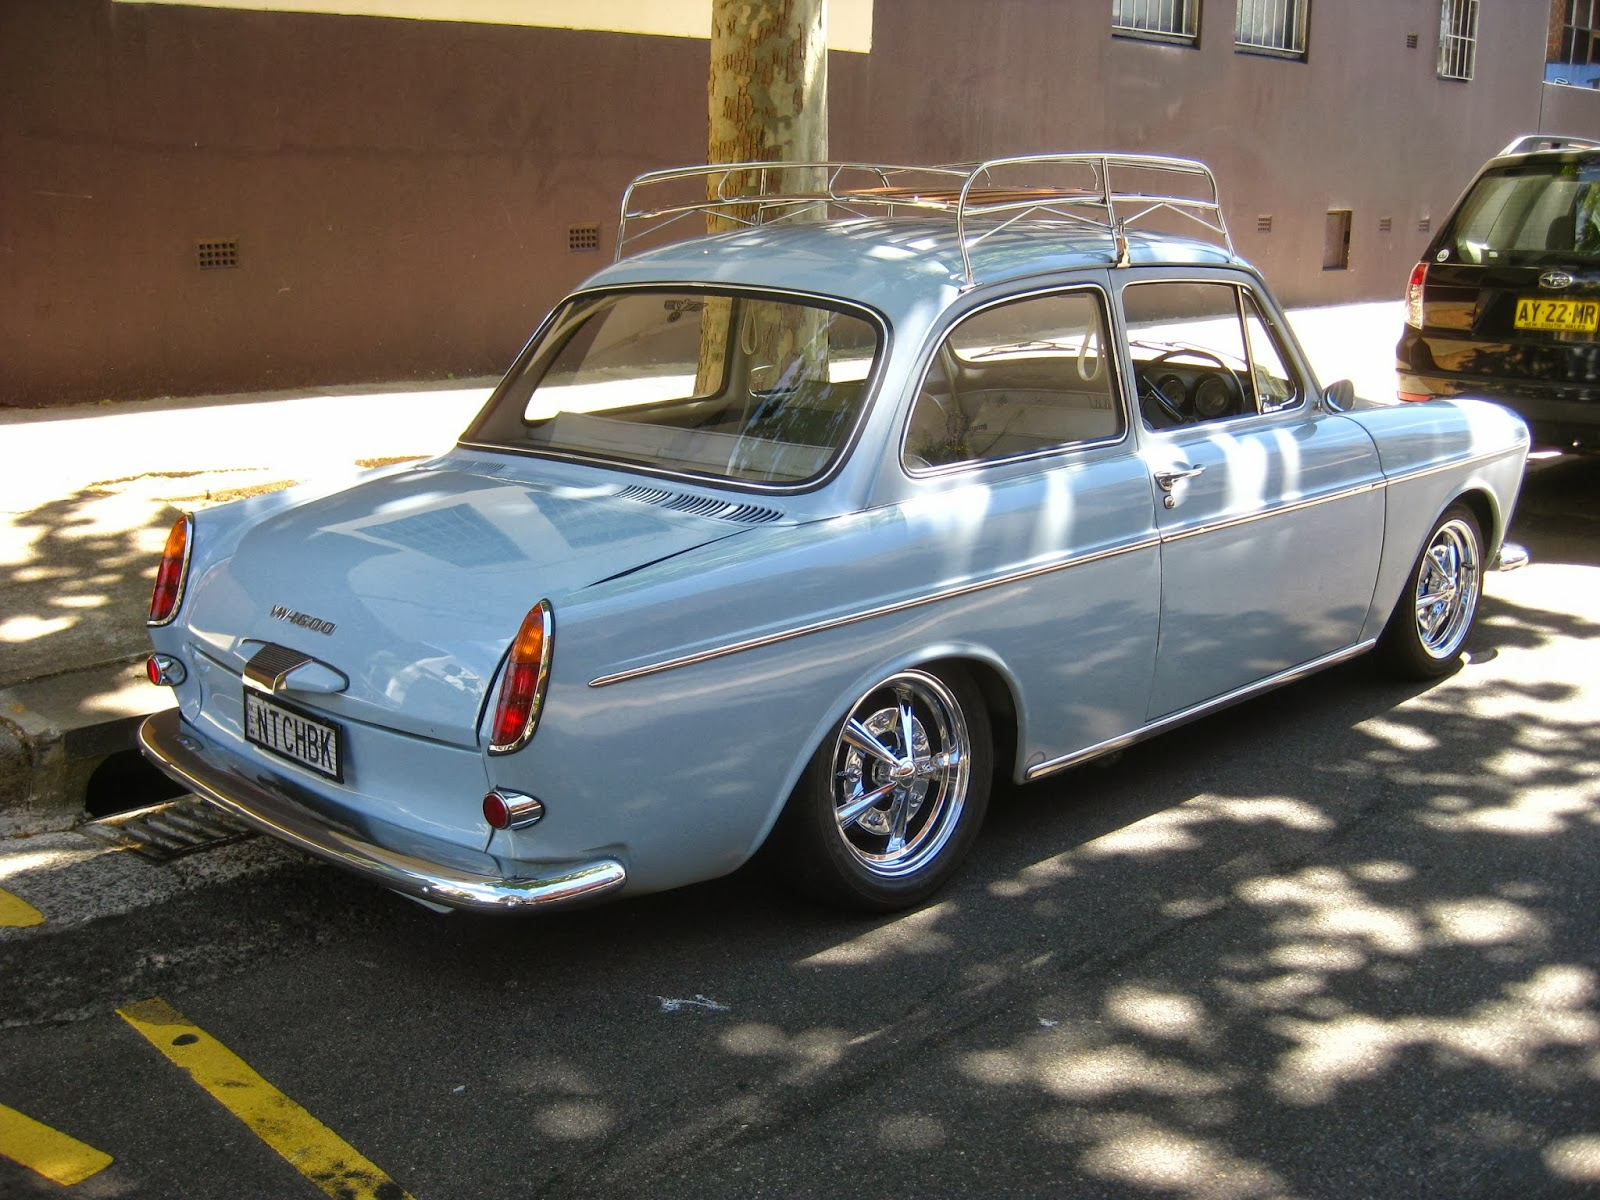 aussie old parked cars 1967 volkswagen type 3 1600 notchback. Black Bedroom Furniture Sets. Home Design Ideas